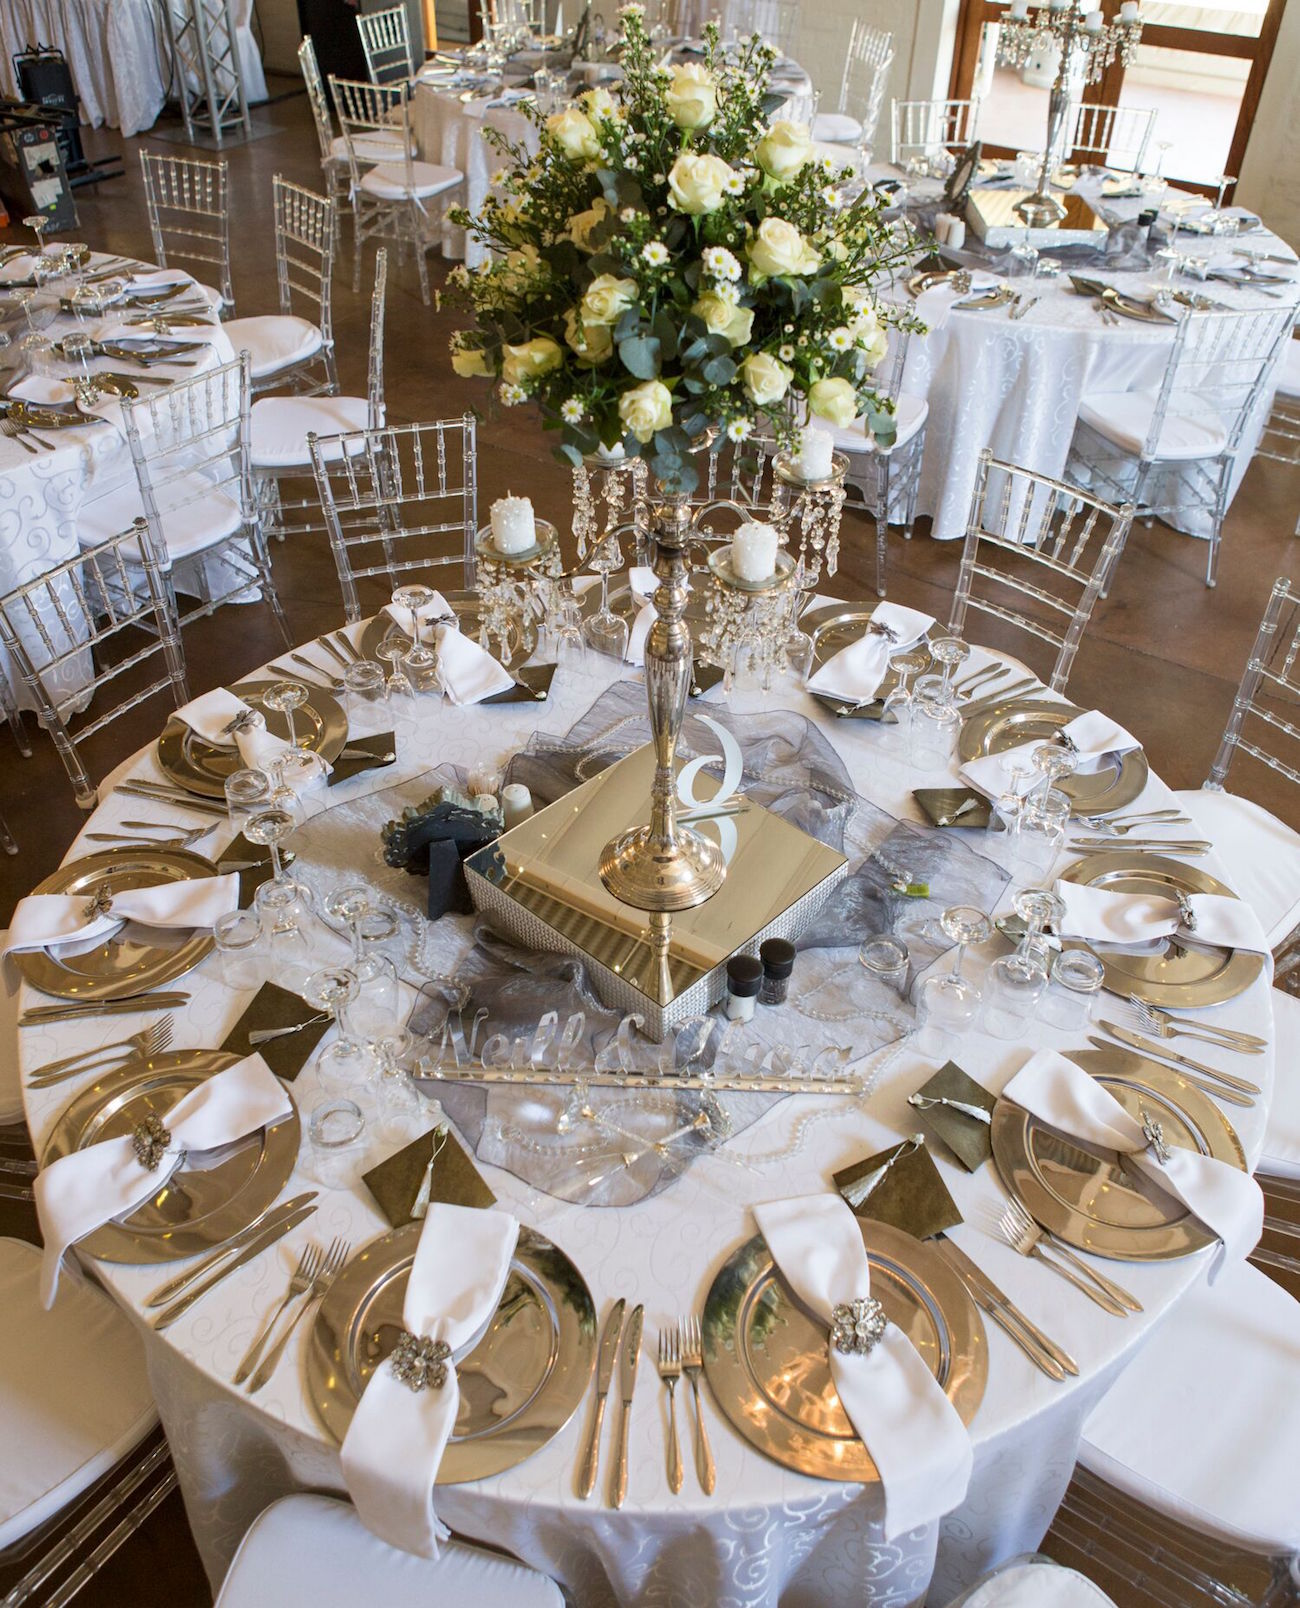 White & Silver Wedding Decor | Image: Daniel West